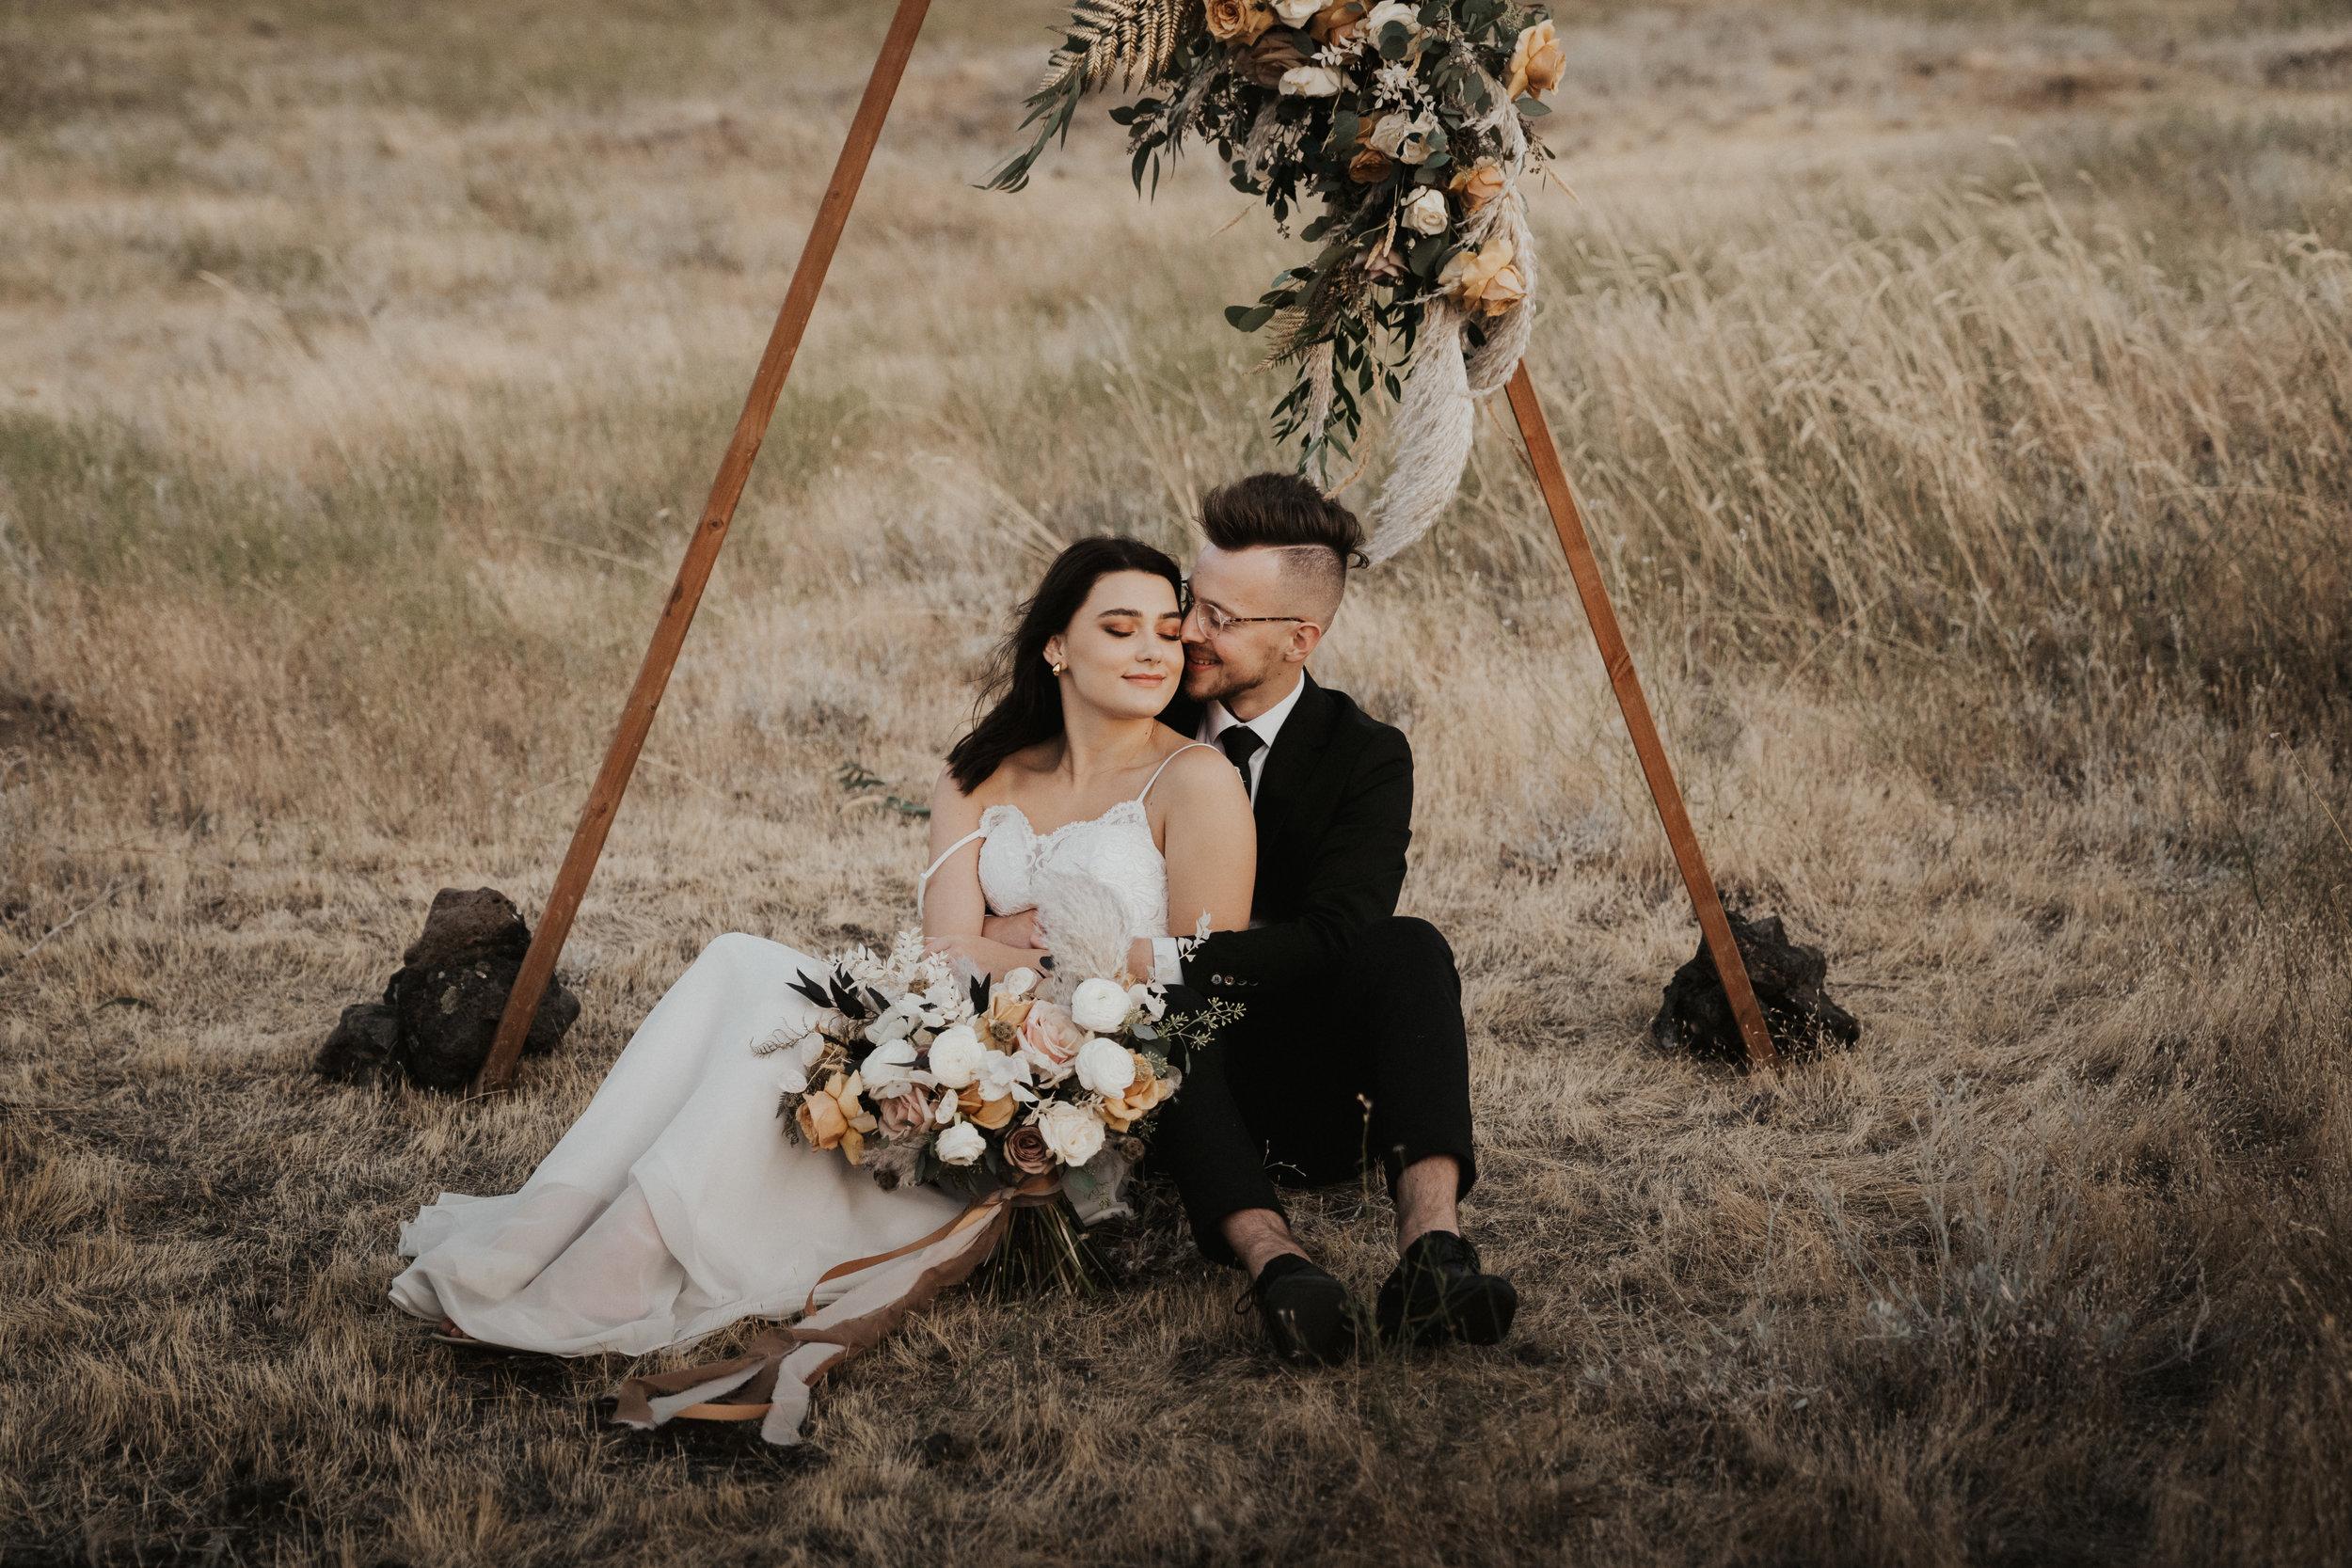 columbia-river-gorge-wedding-elopement-inspiration-26.jpg